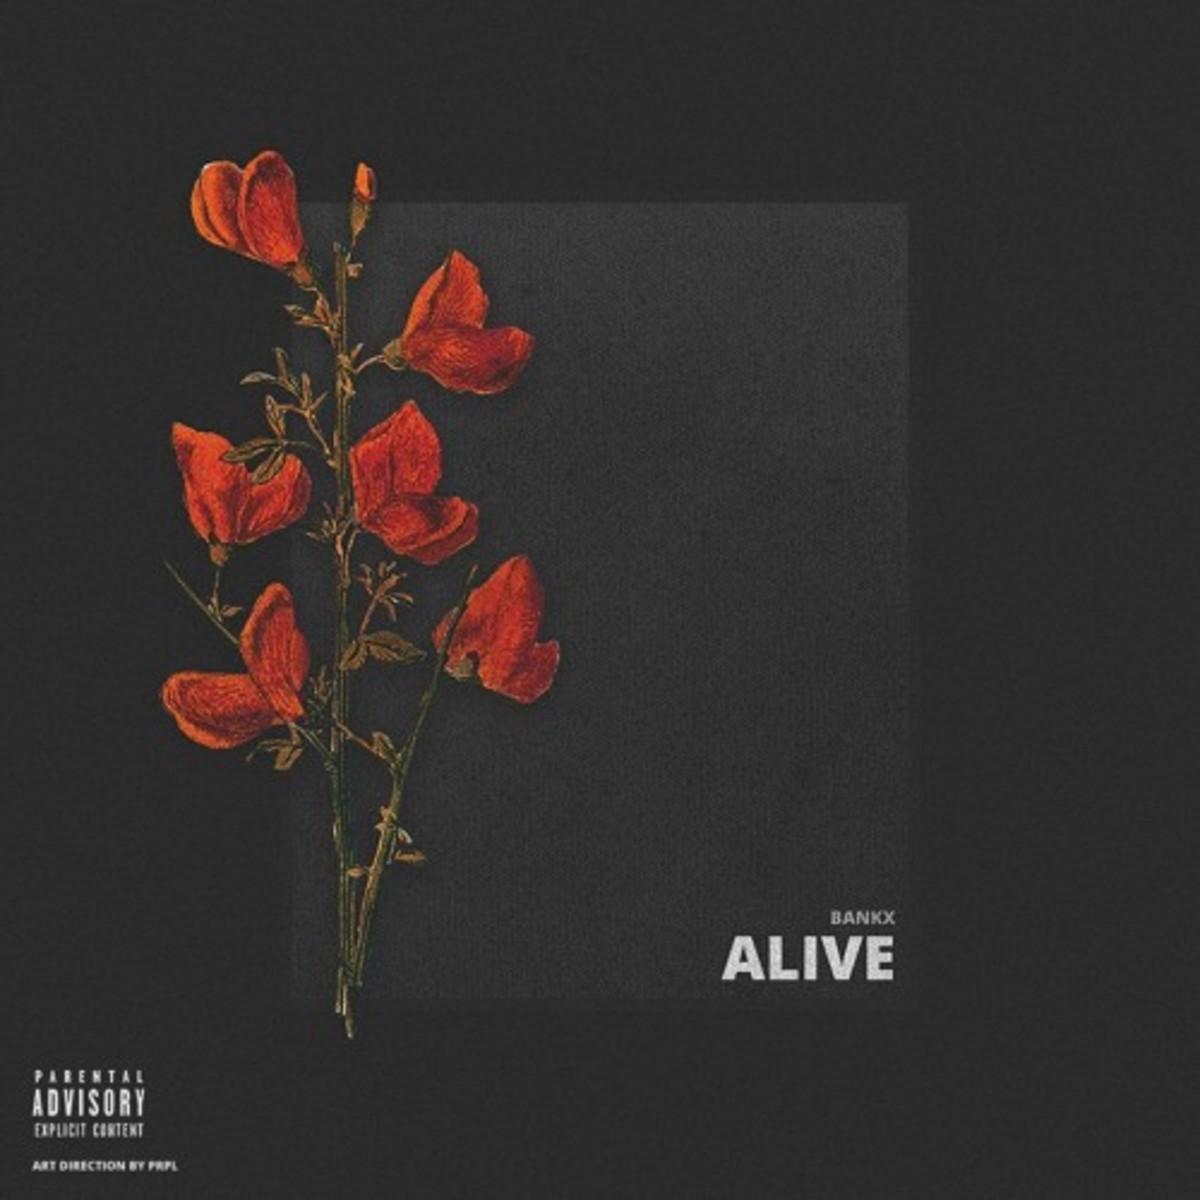 bankx-alive.jpg